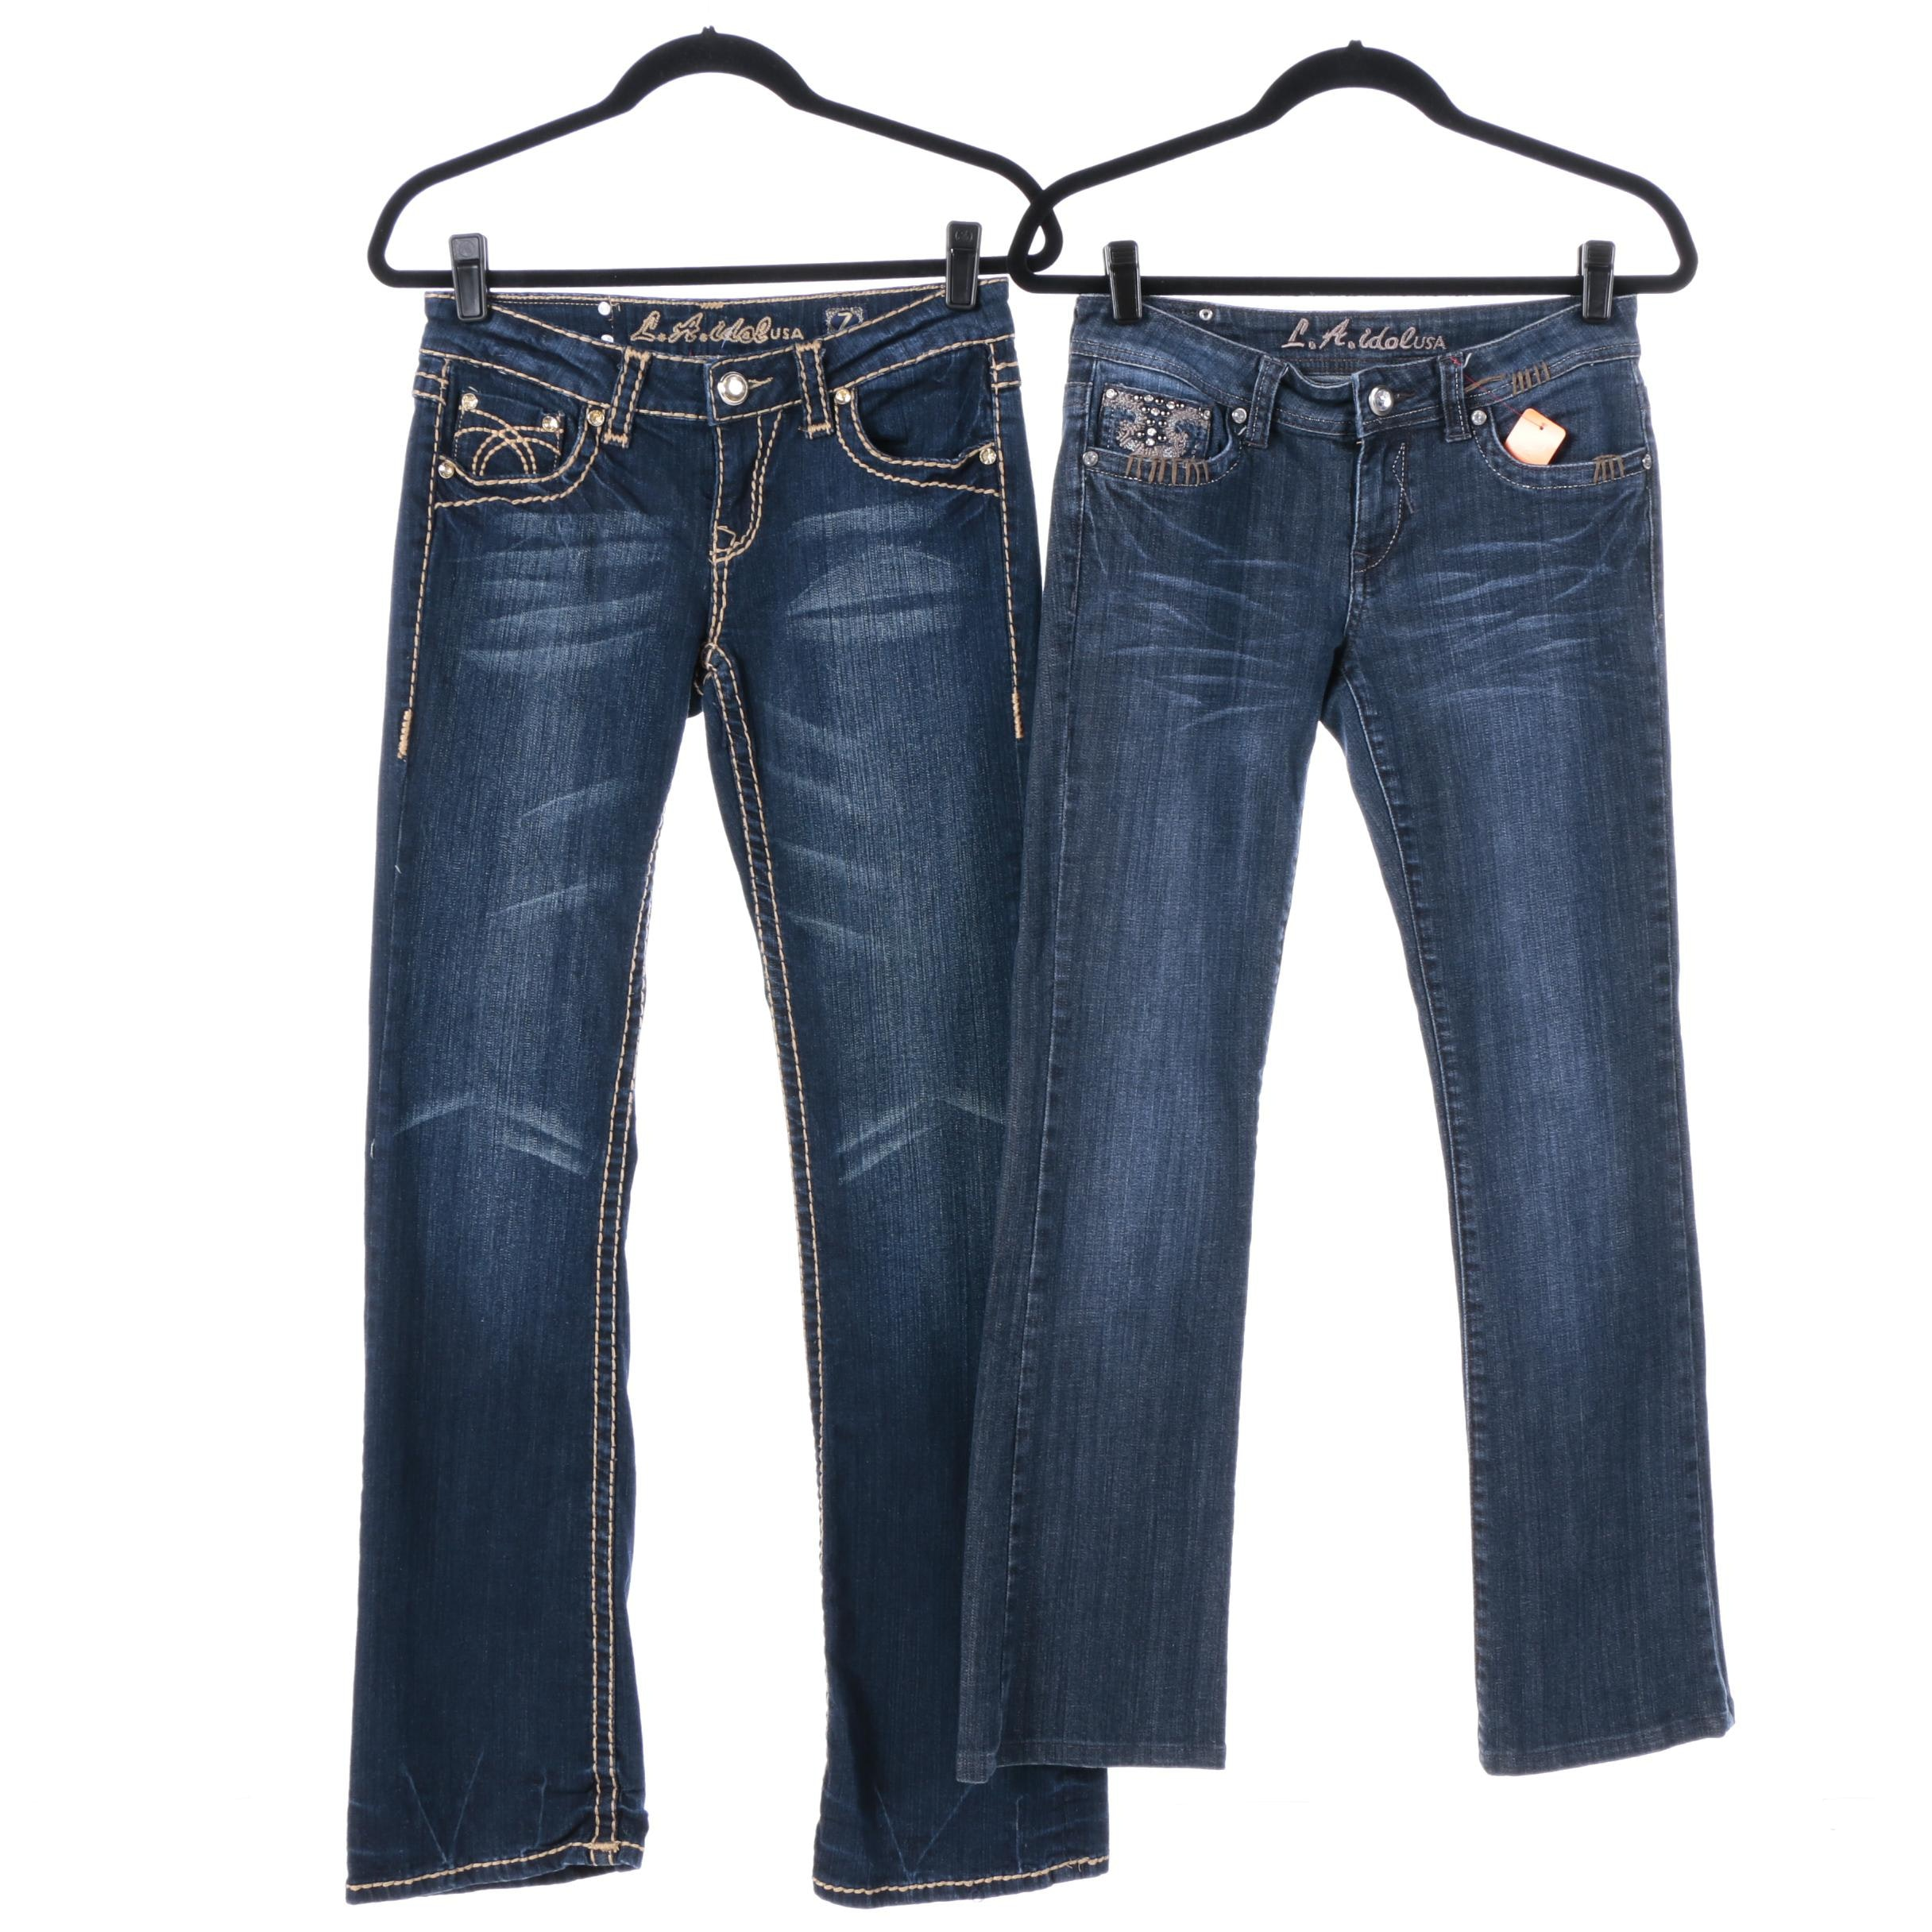 Women's L.A. Idol Jeans